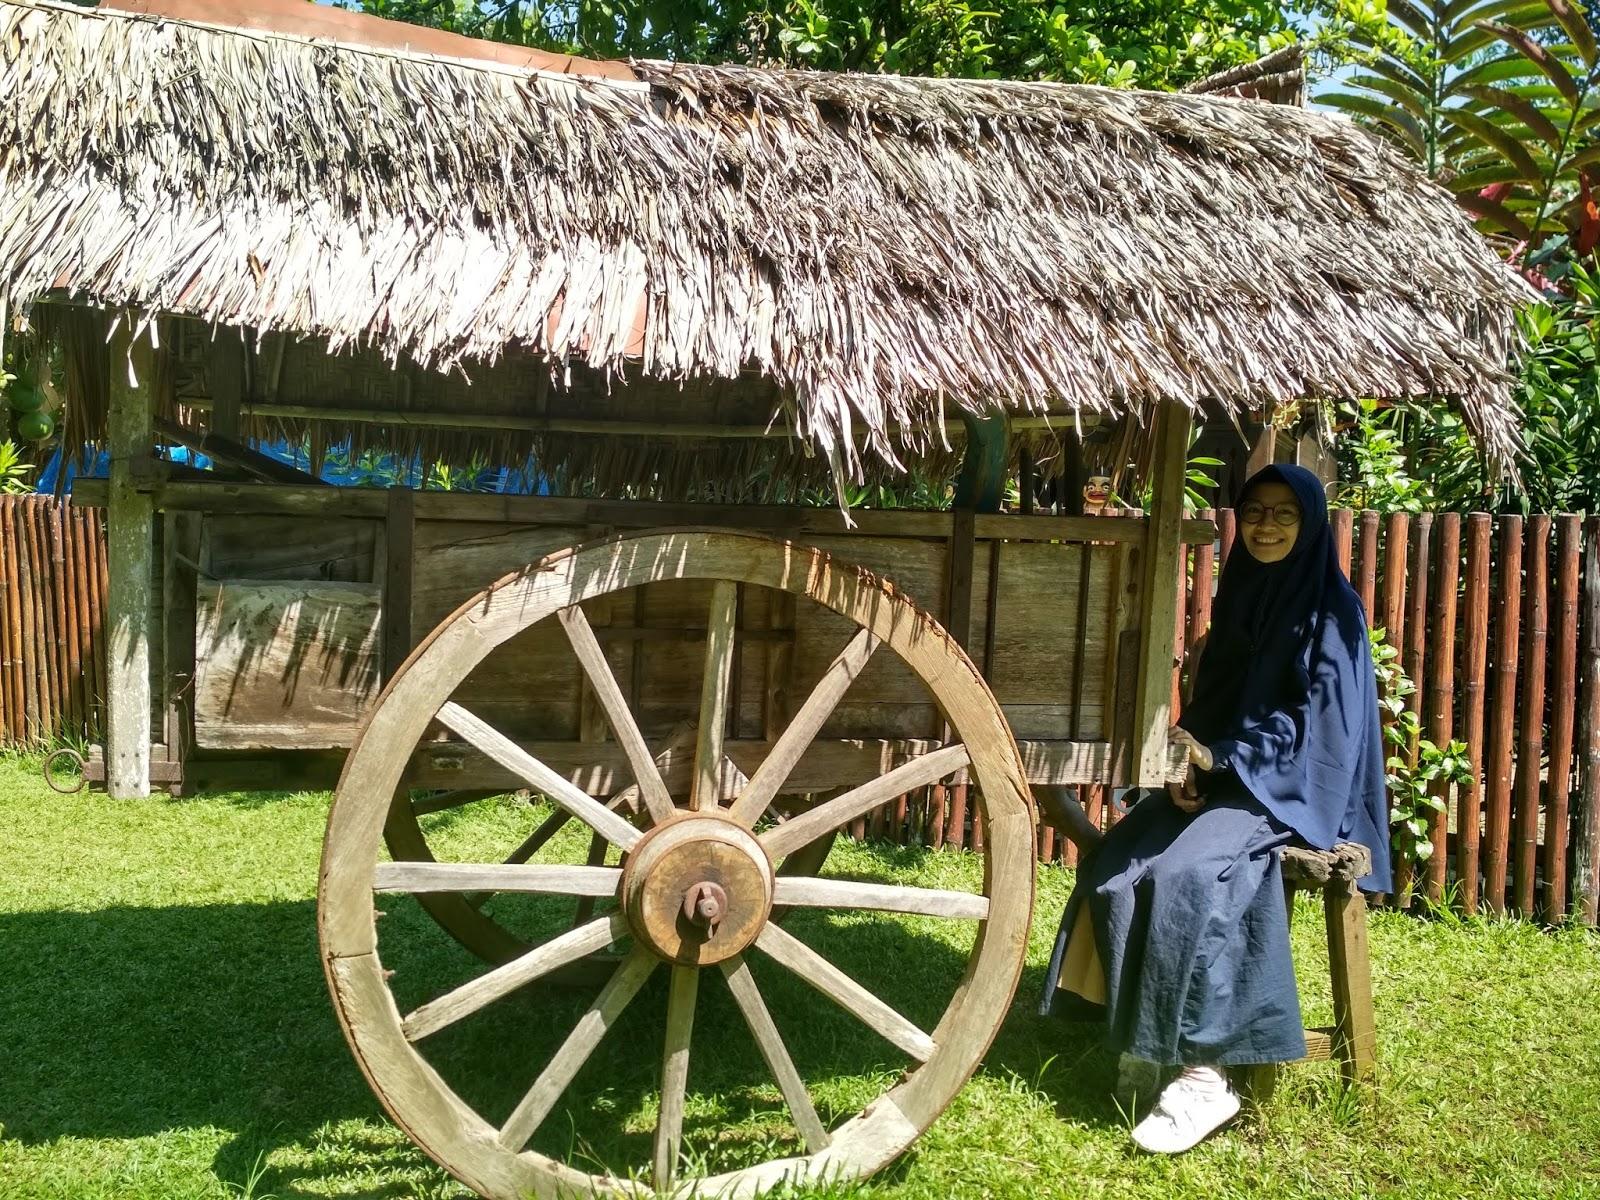 Kampoeng Wisata Rumah Joglo Khas Jawa Rasa Bogor Warta